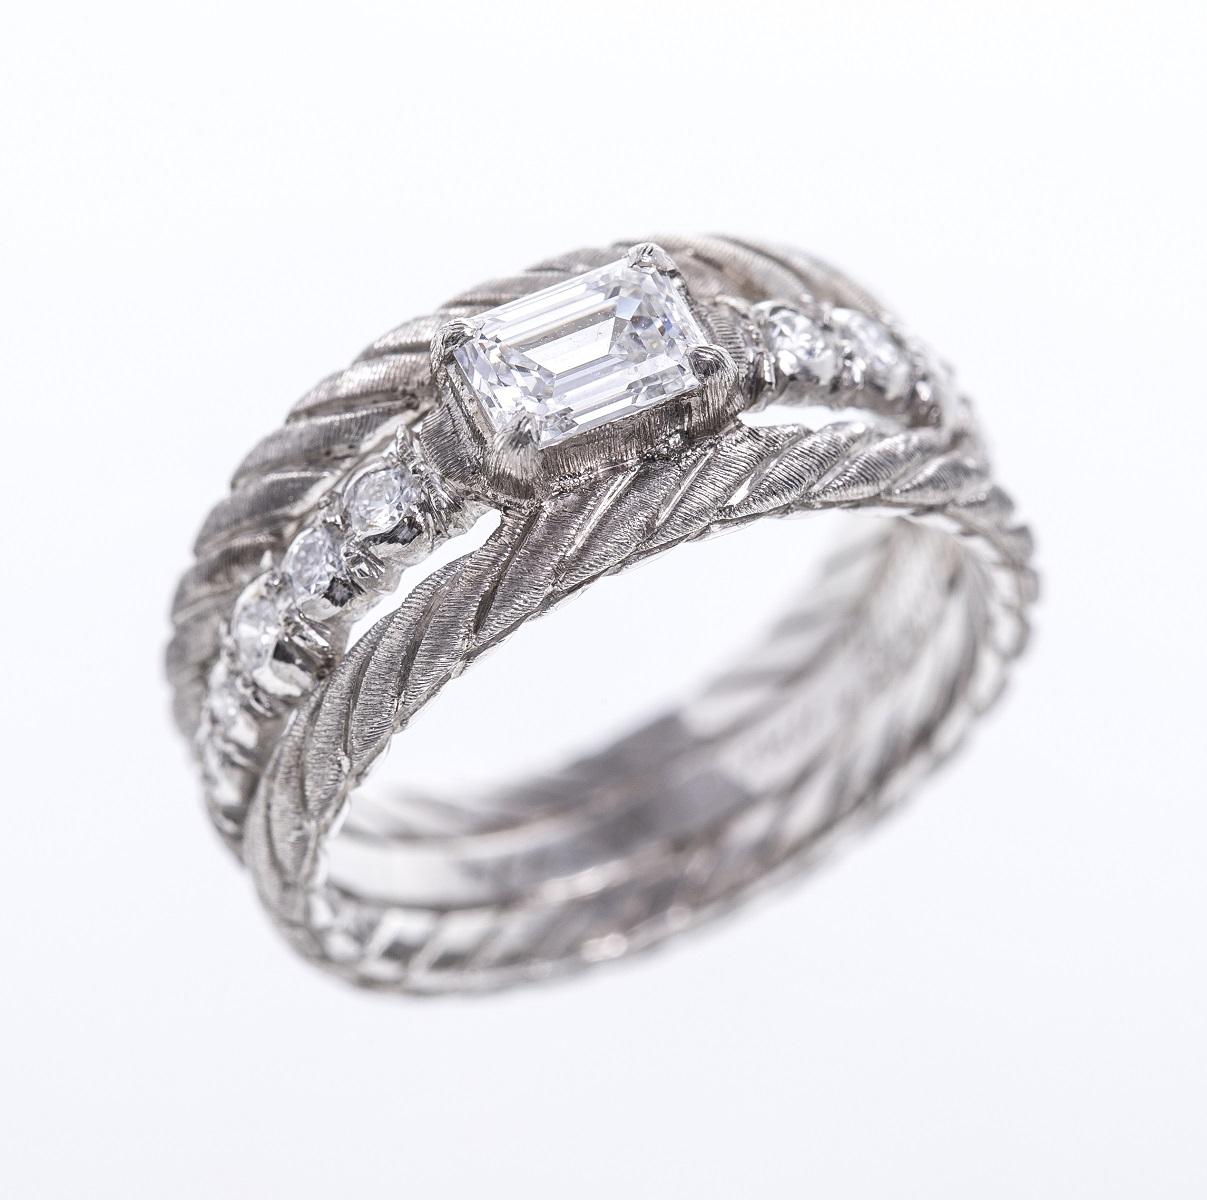 GIANMARIA BUCCELLATI ジャンマリア ブチェラッティ ダイヤモンドリング 指輪 #13 送料無料 【トレジャースポット】【中古】